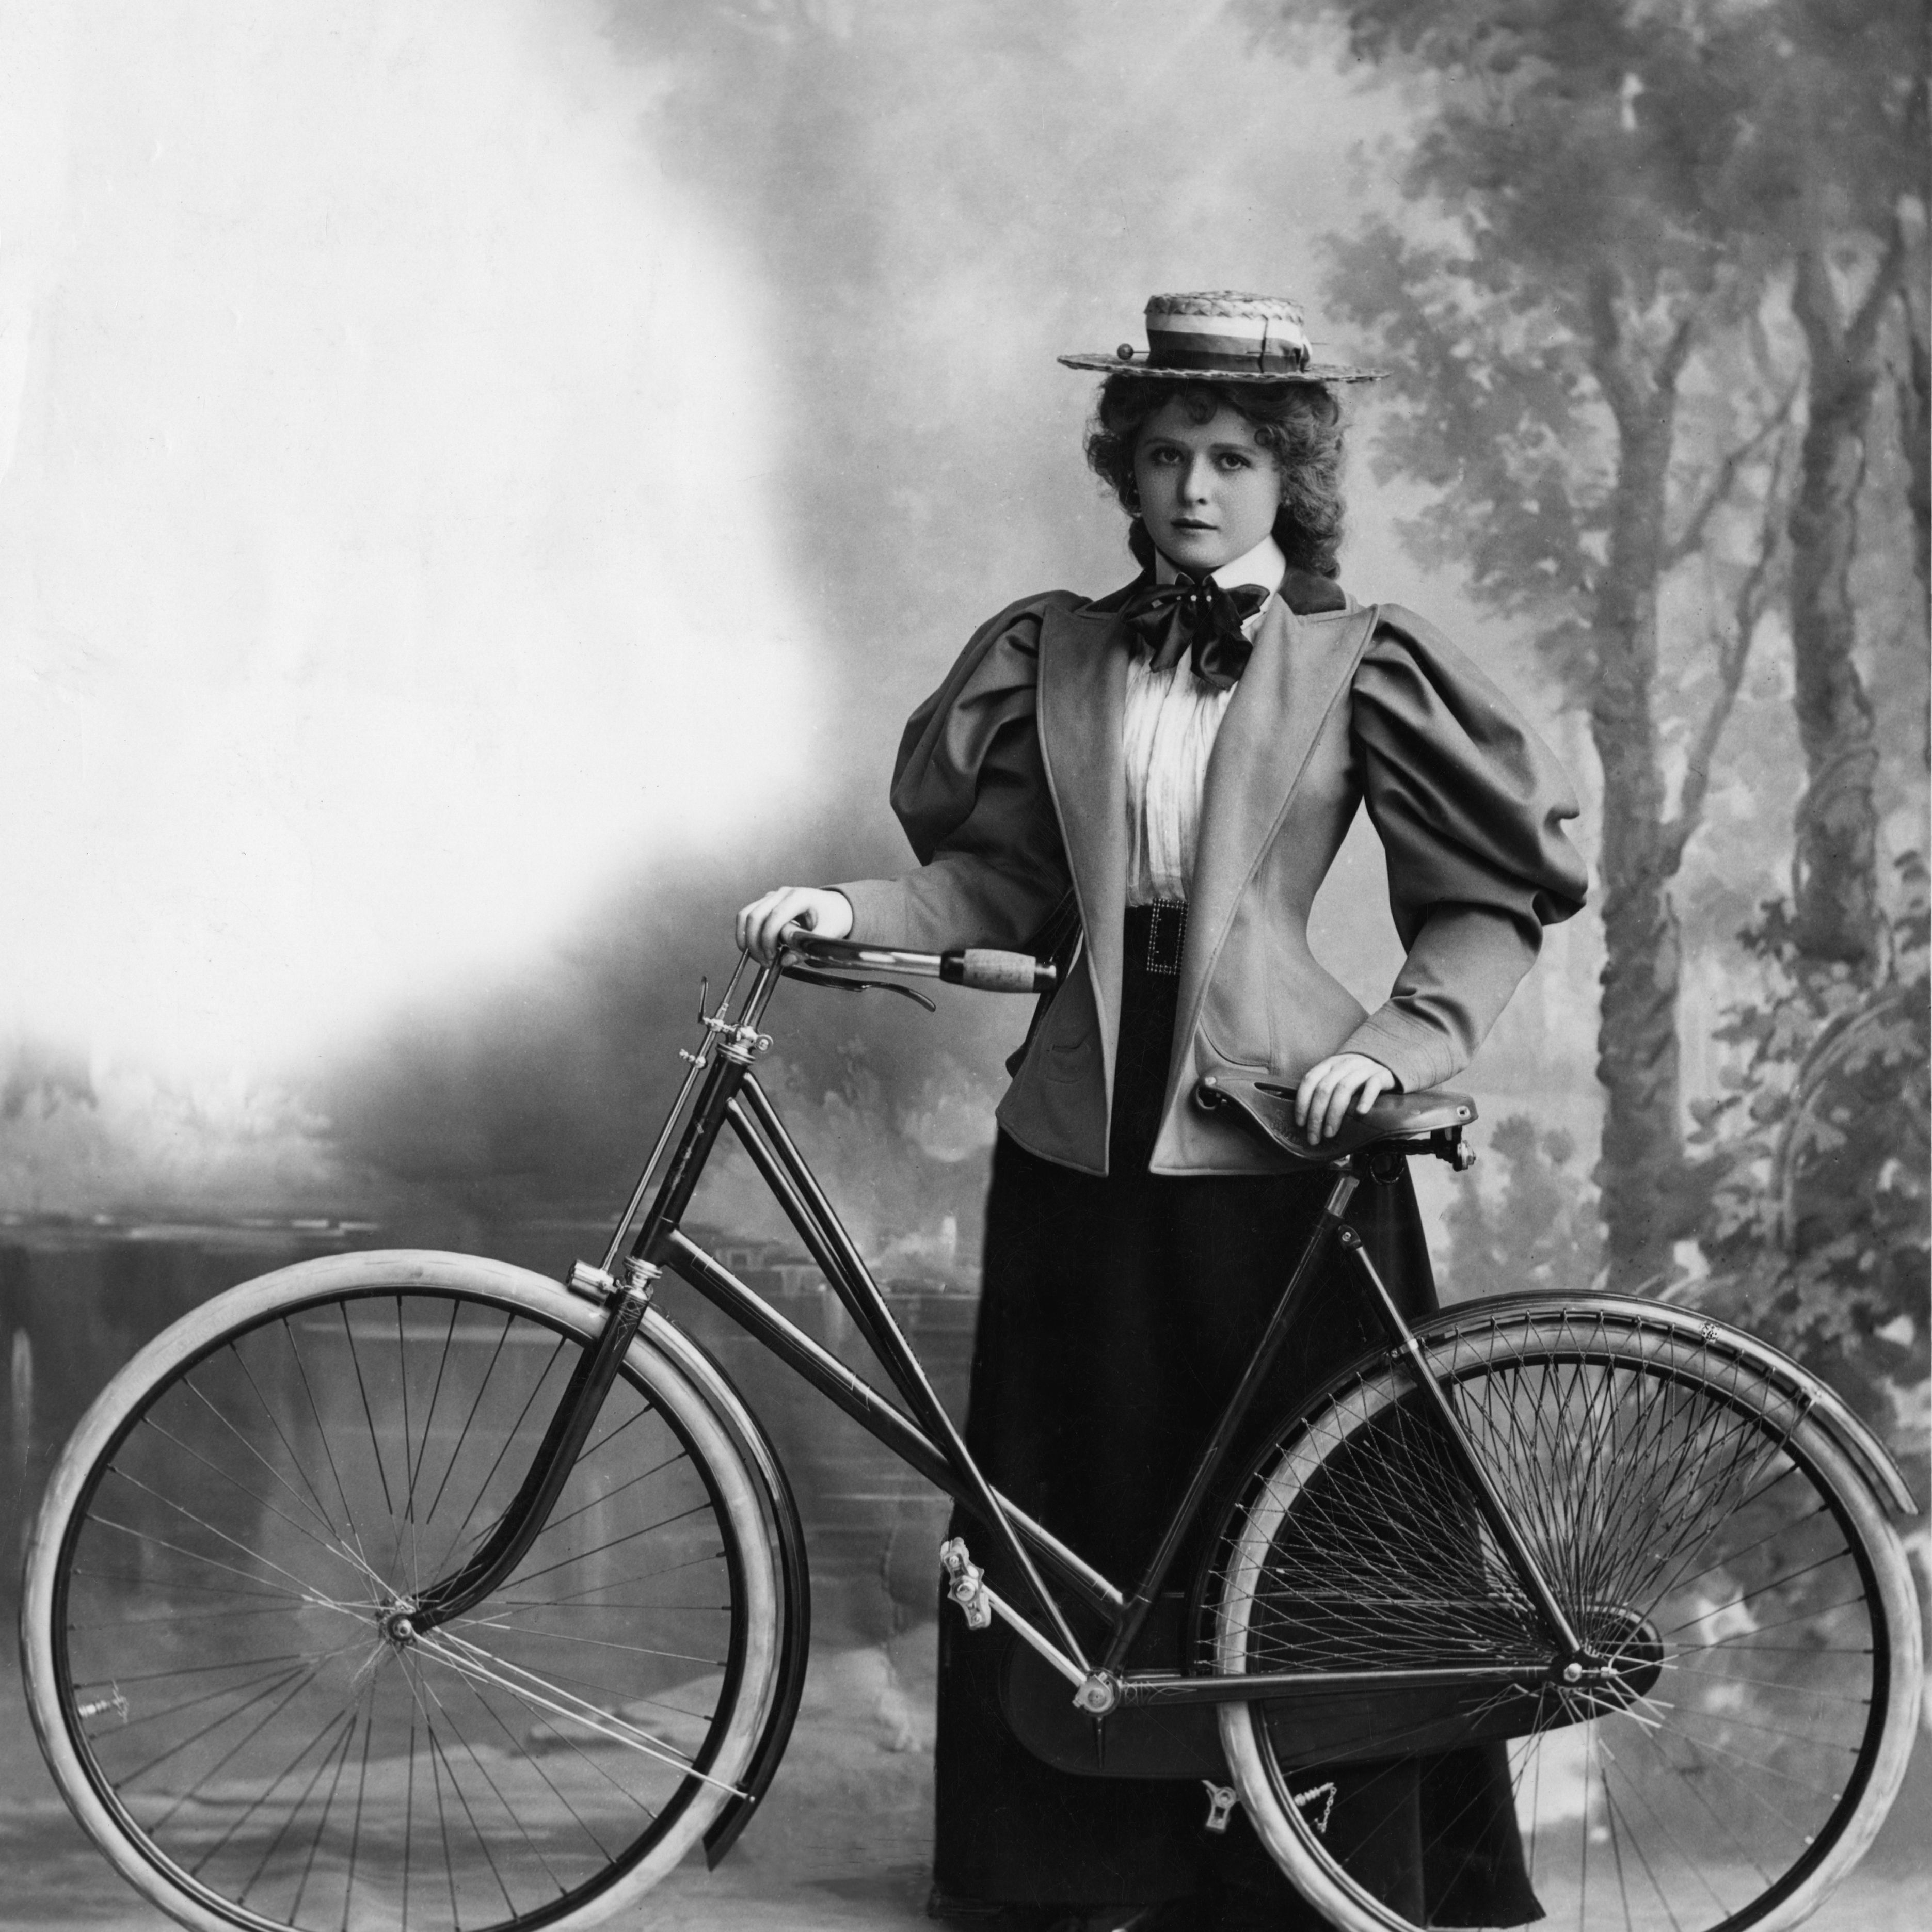 woman and bike, circa 1895